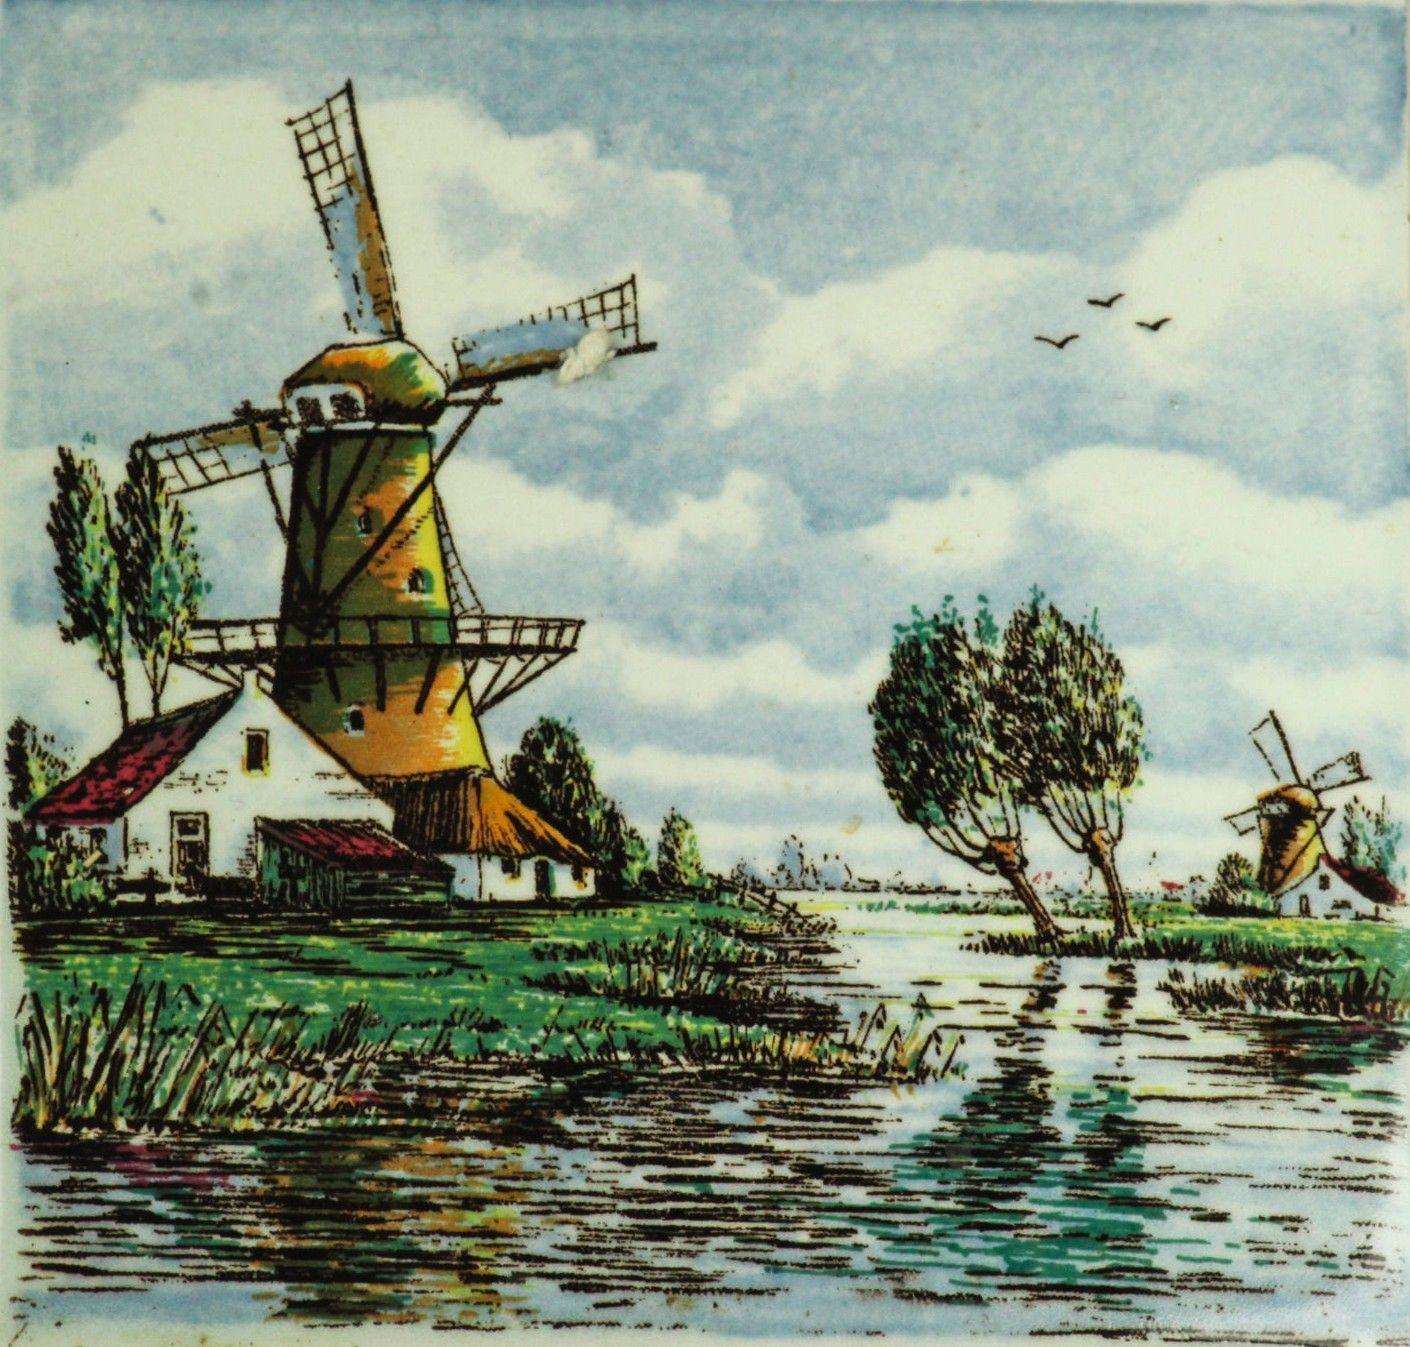 Vintage Painted Decorative Tile, Holland, Windmill